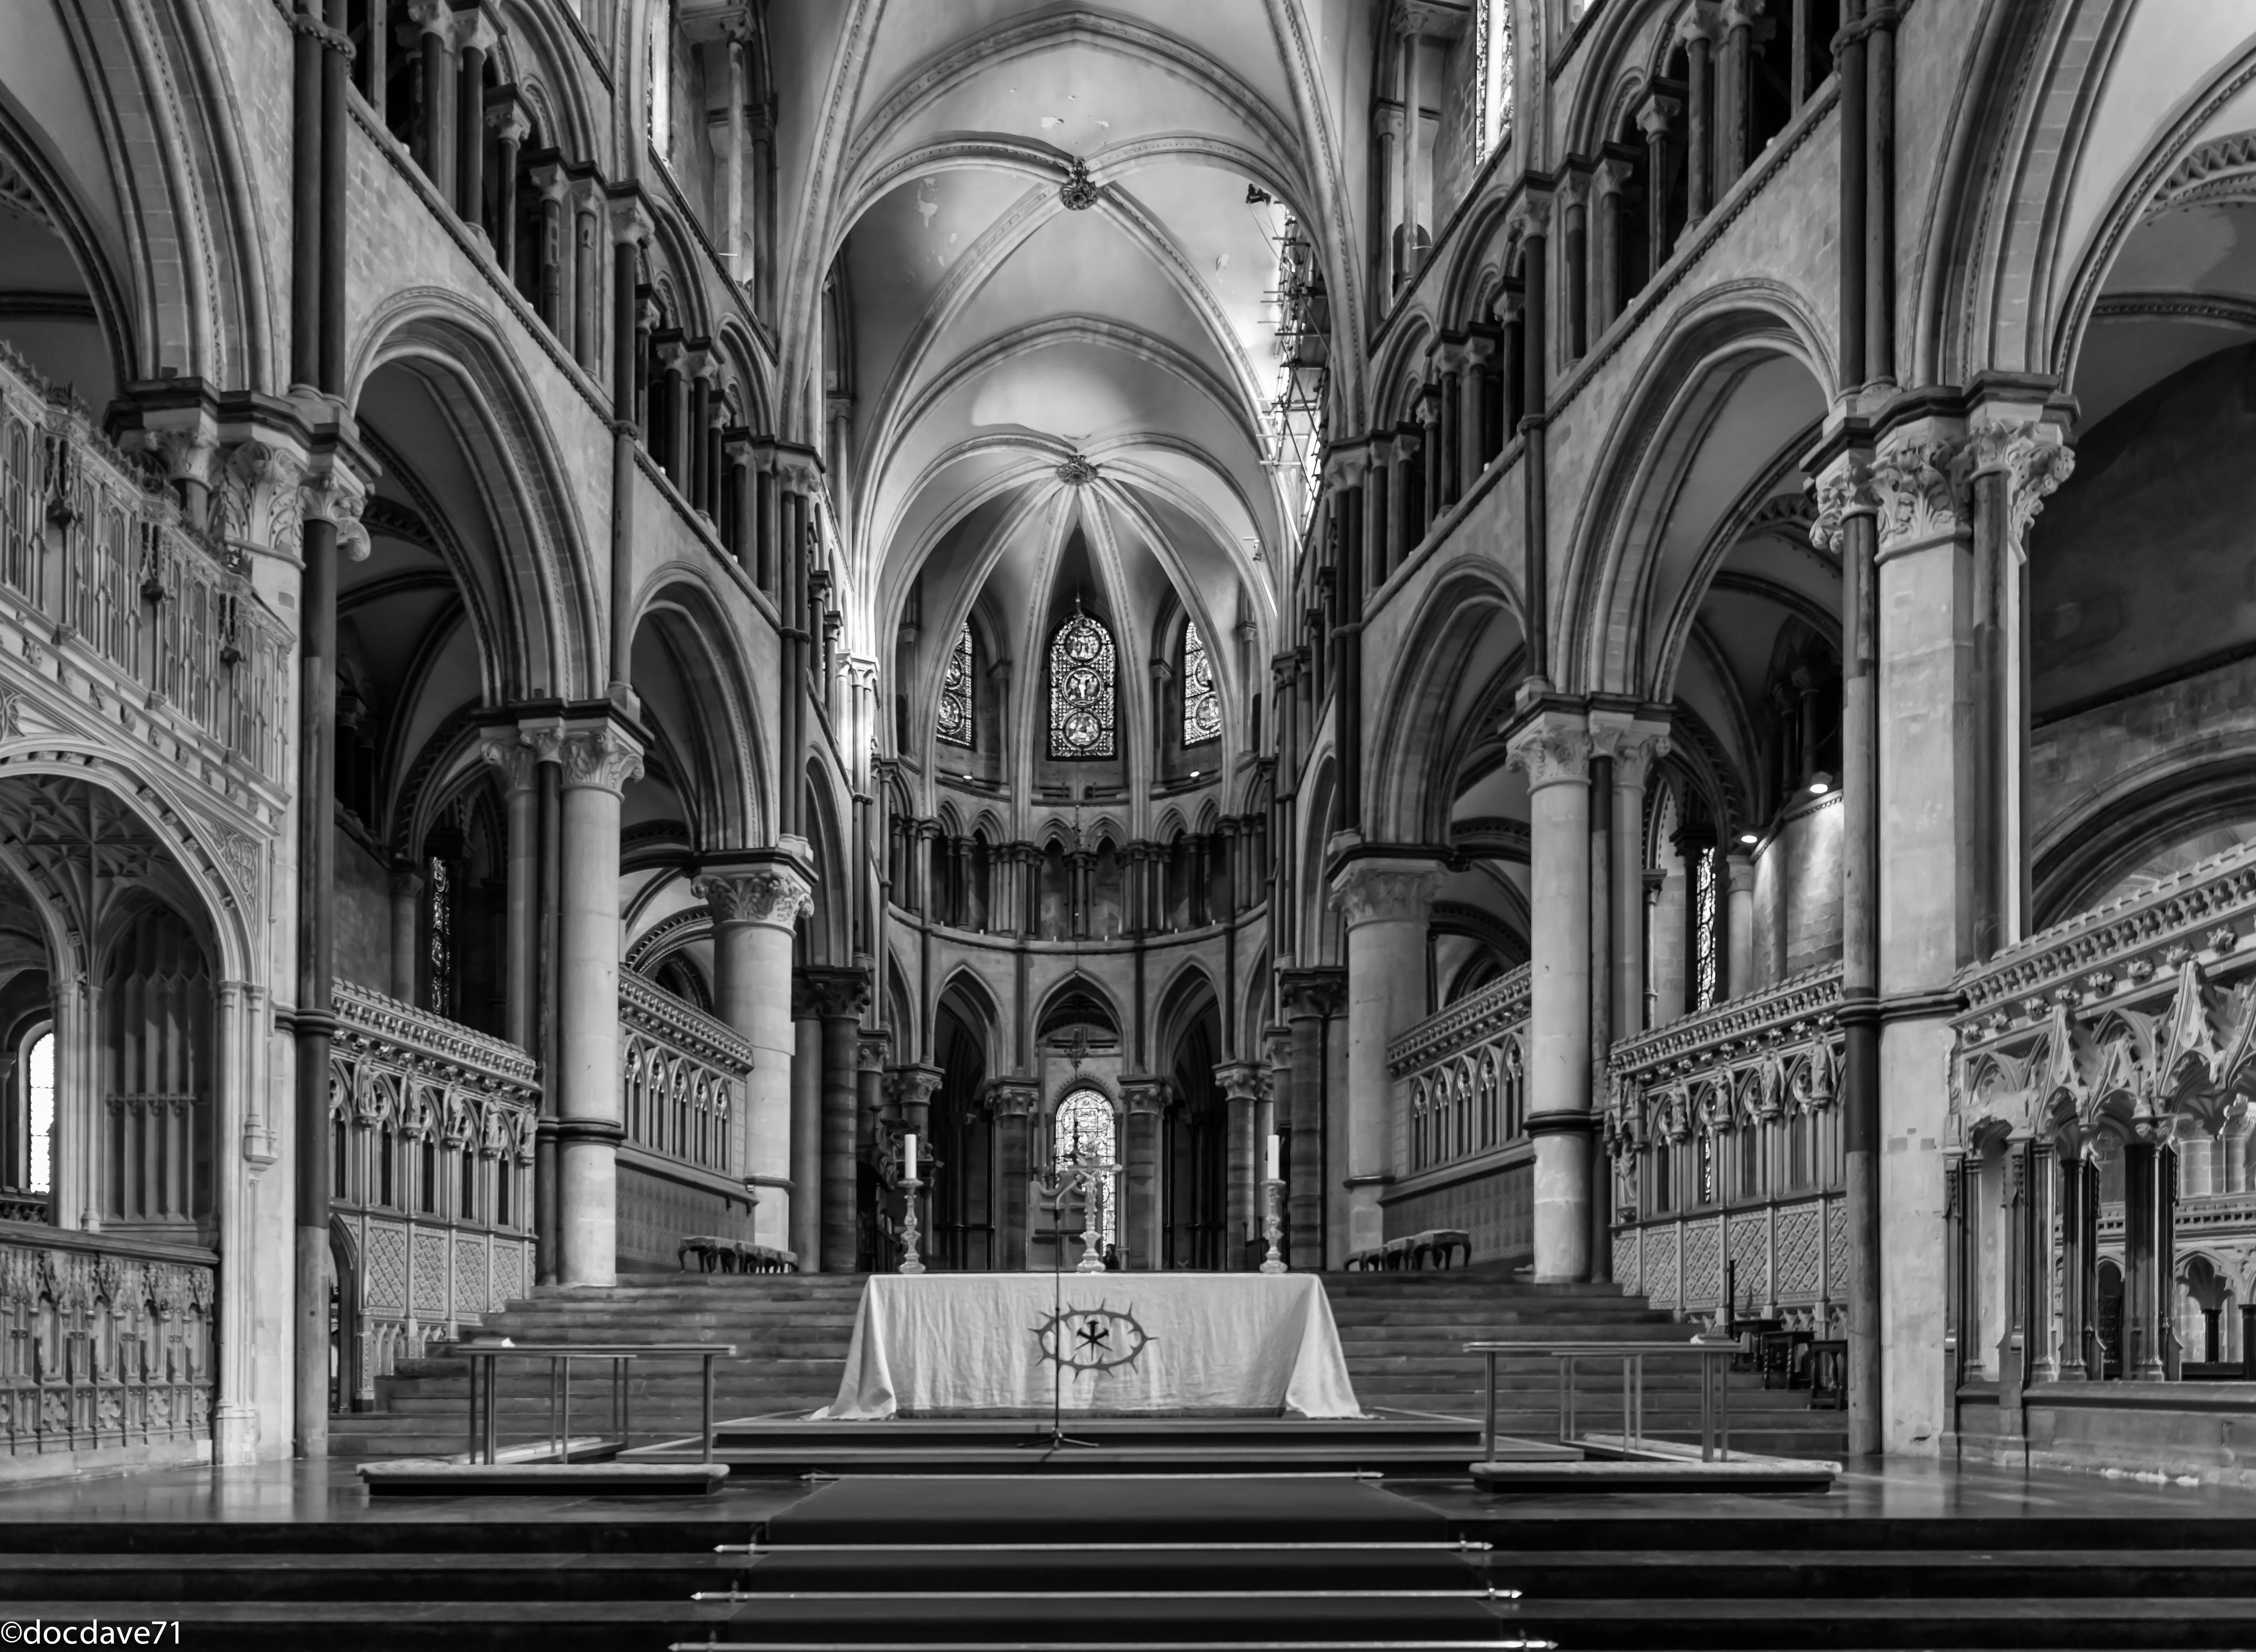 Gothic ornament in architecture and interior